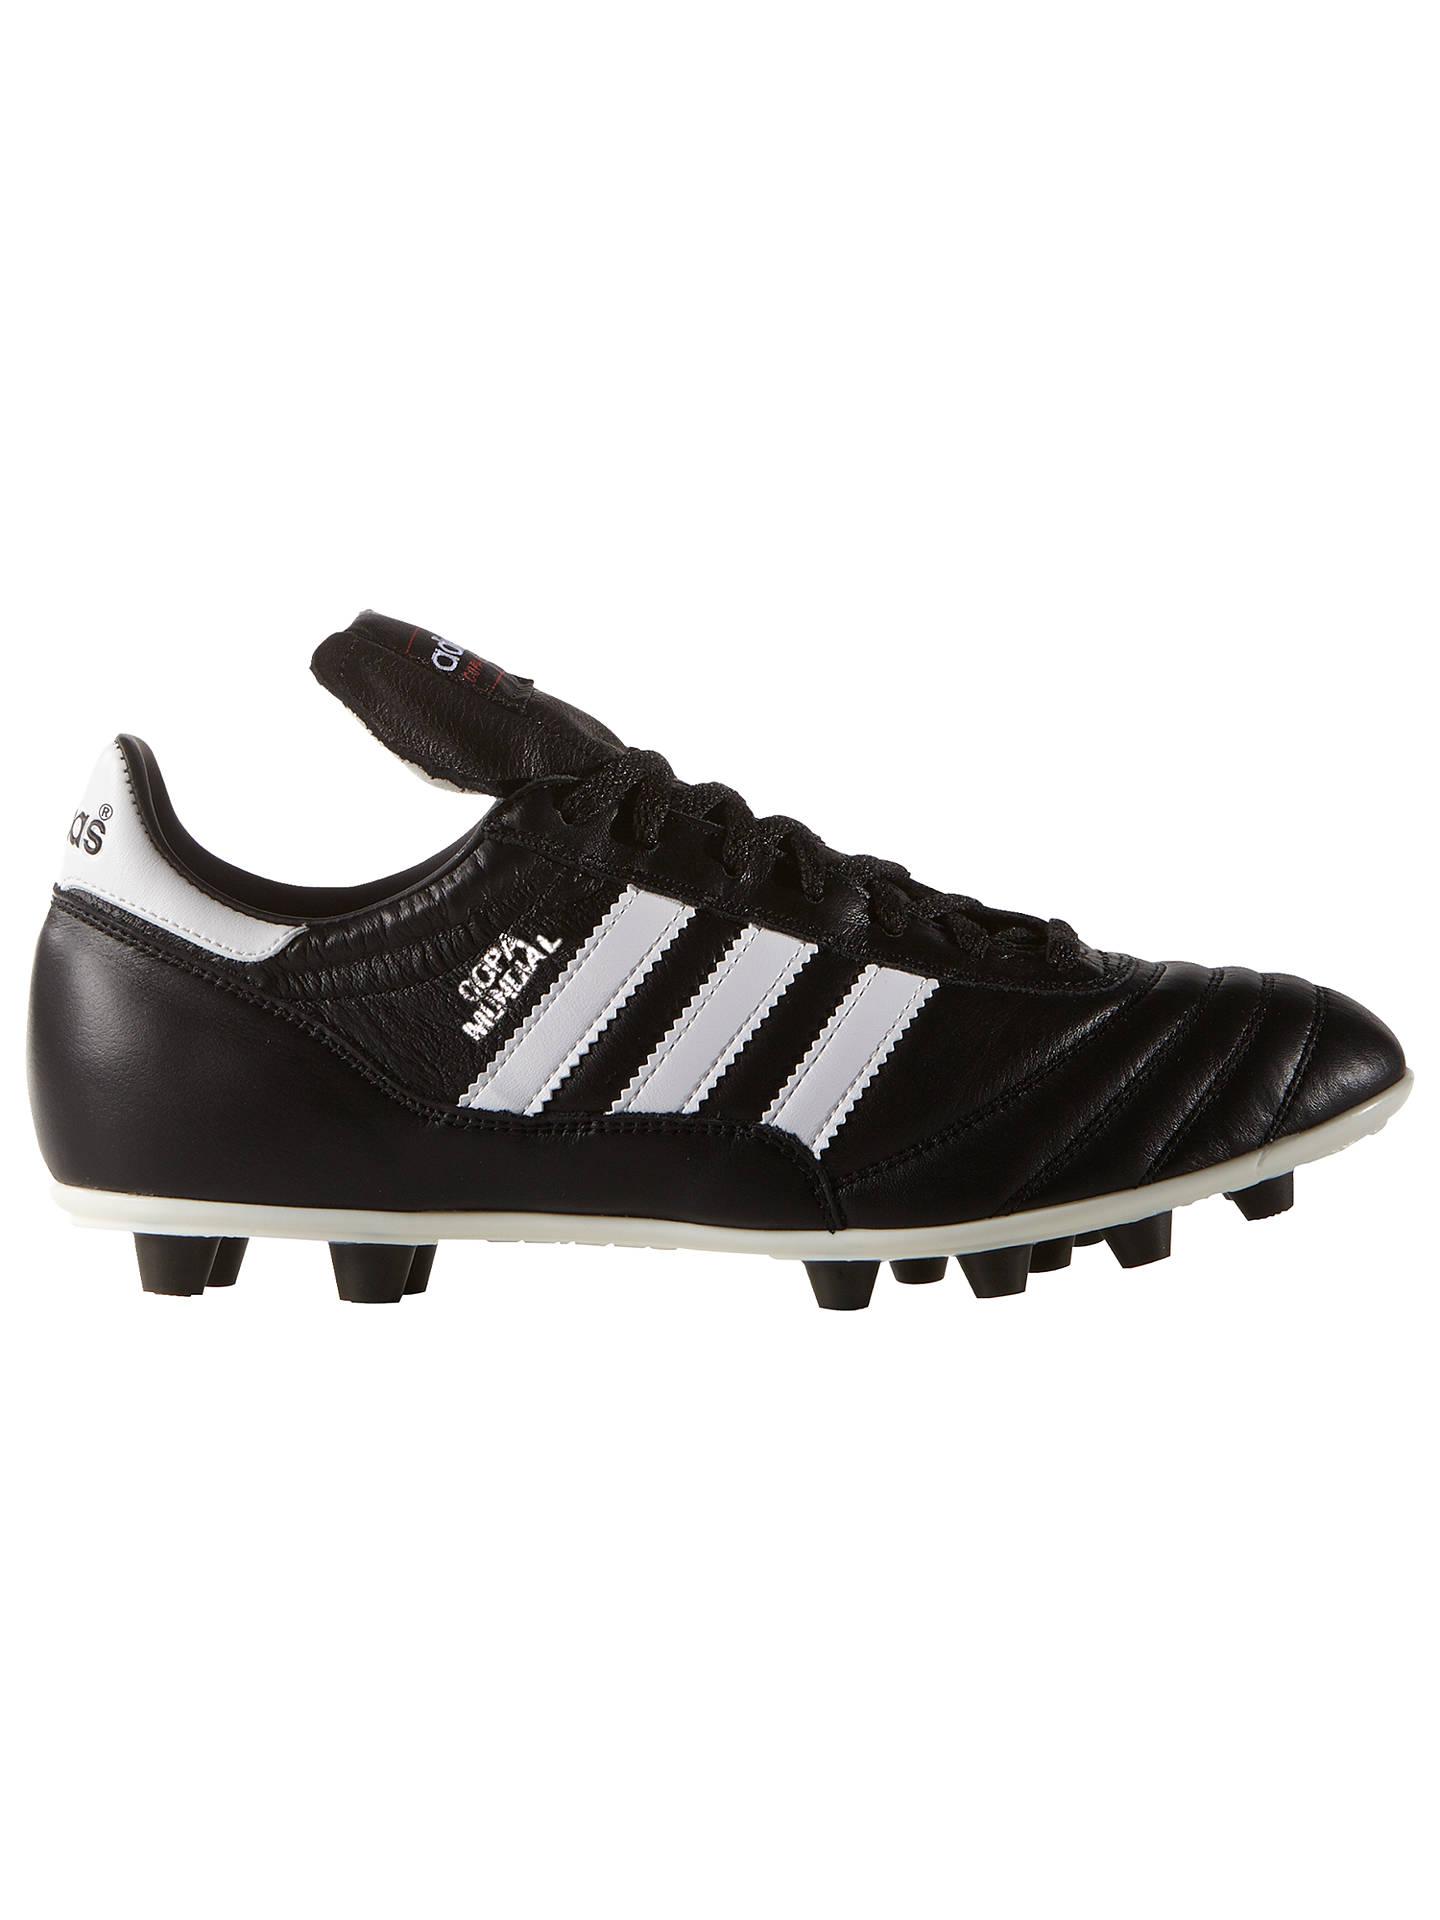 the latest e98dc fba1b Buyadidas Copa Mundial Samba Mens Football Boots, BlackWhite, 7 Online at  johnlewis ...